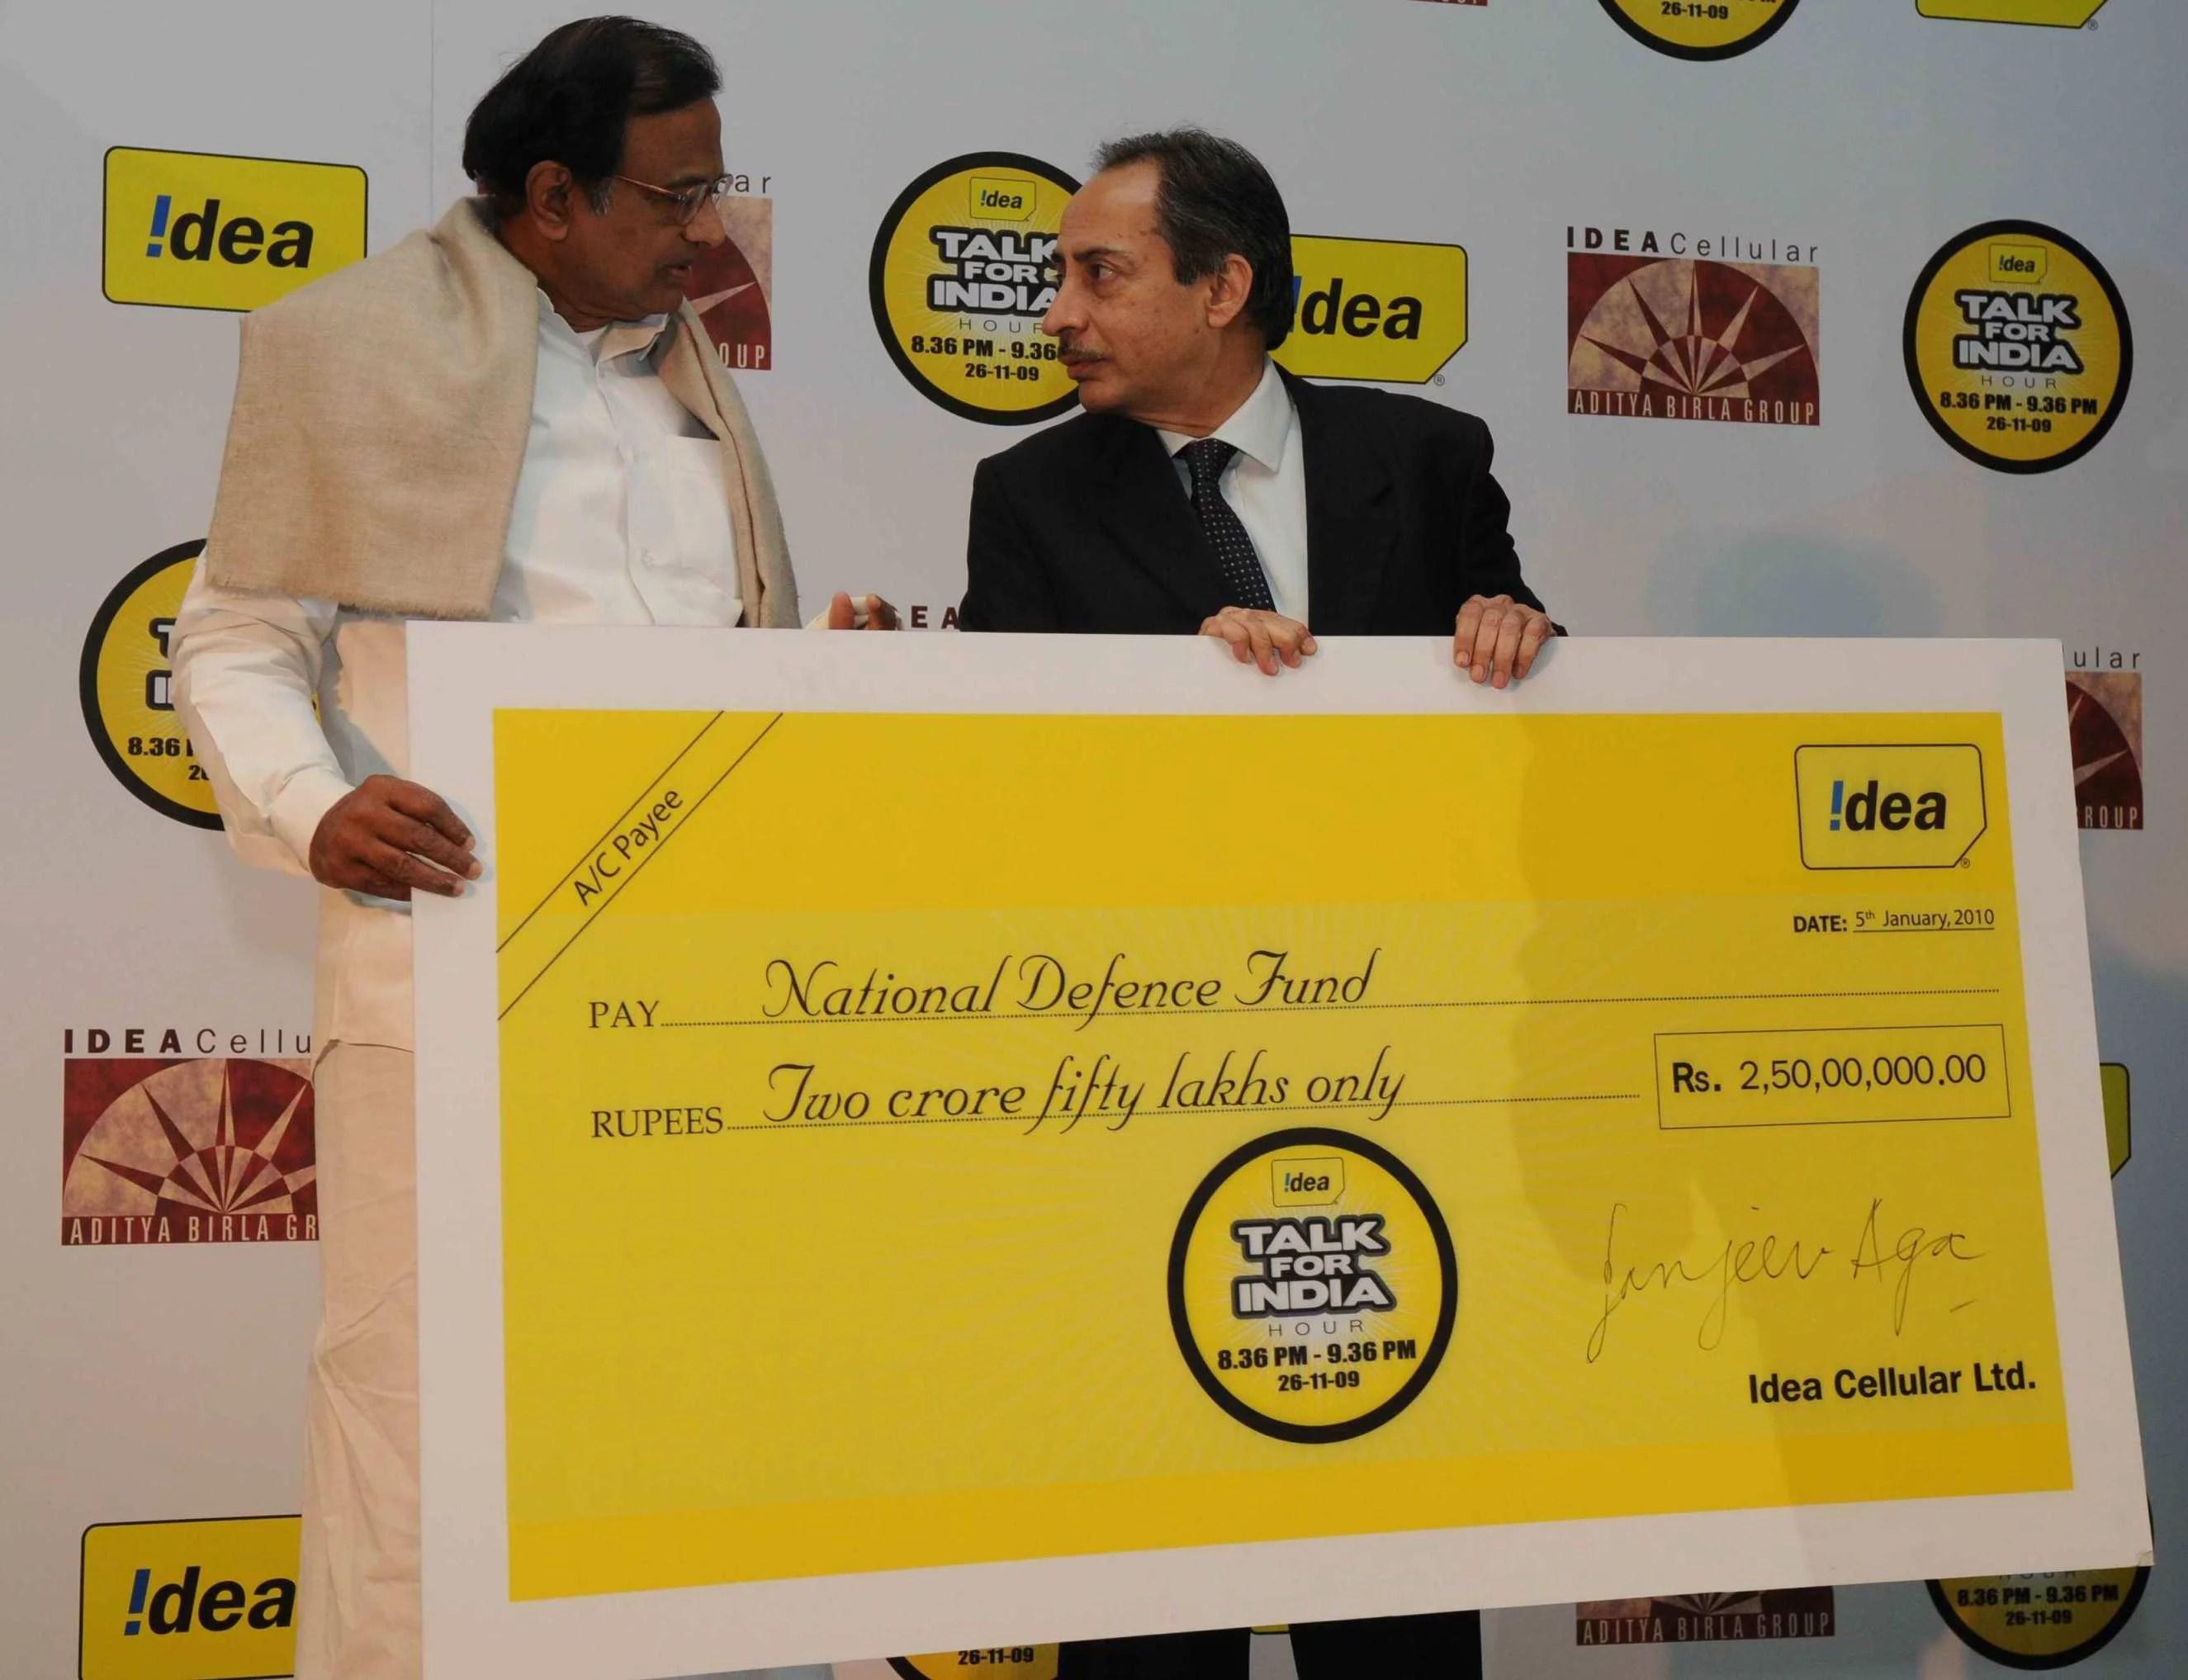 Home Minister Mr. Chidambaram and Mr. Sanjeev Aga, MD, Idea Cellular in New Delhi at an IDEA event